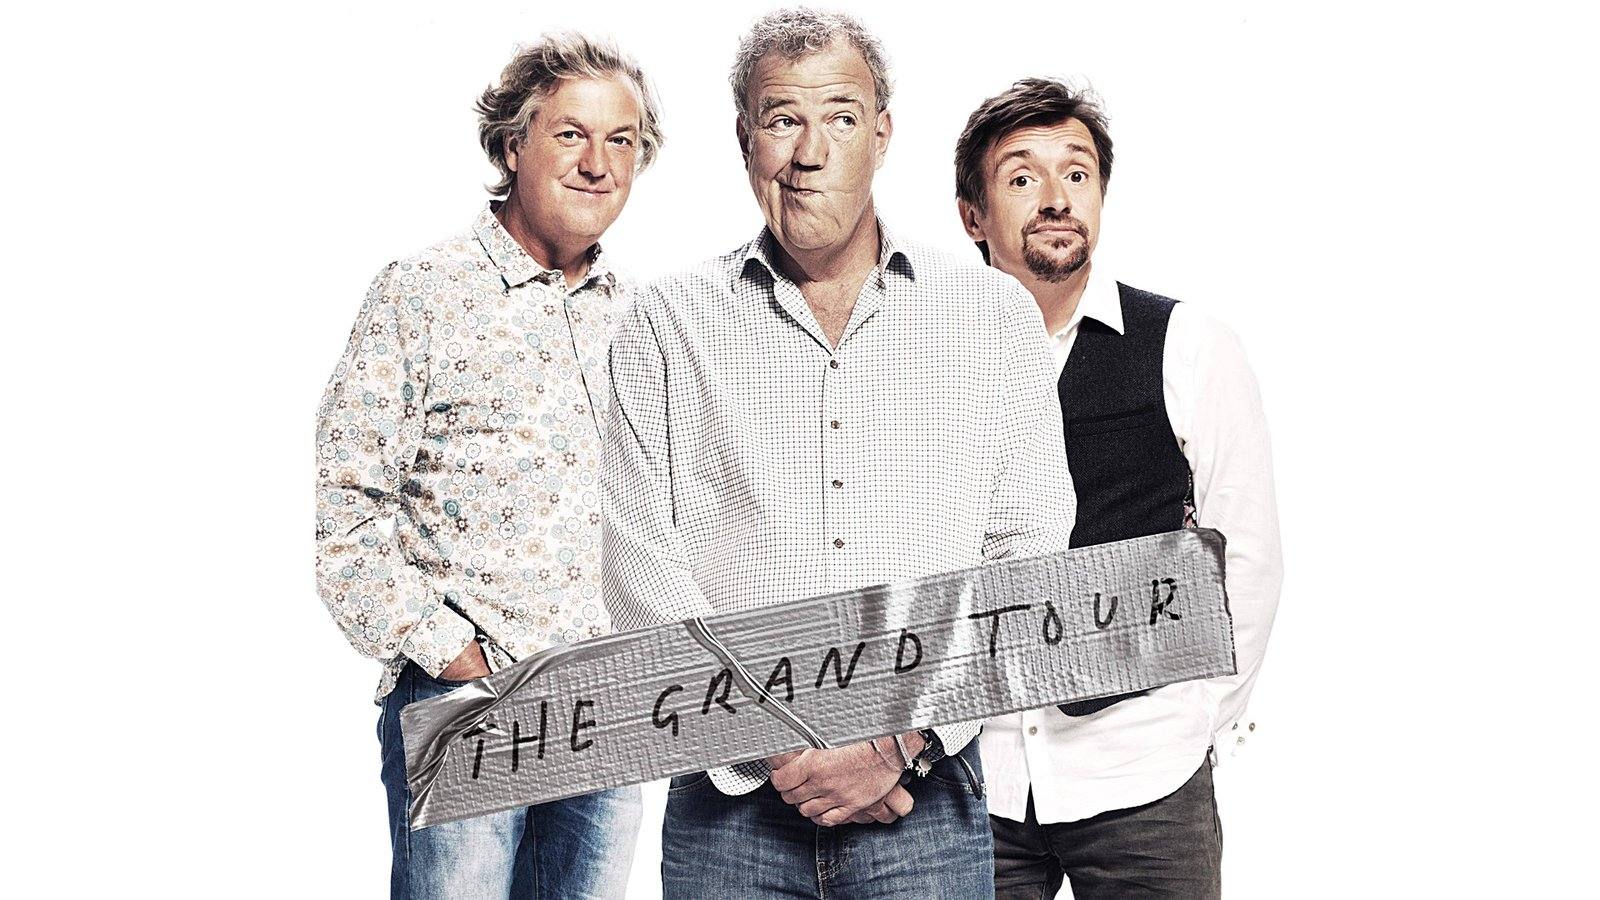 Гранд тур / The Grand Tour